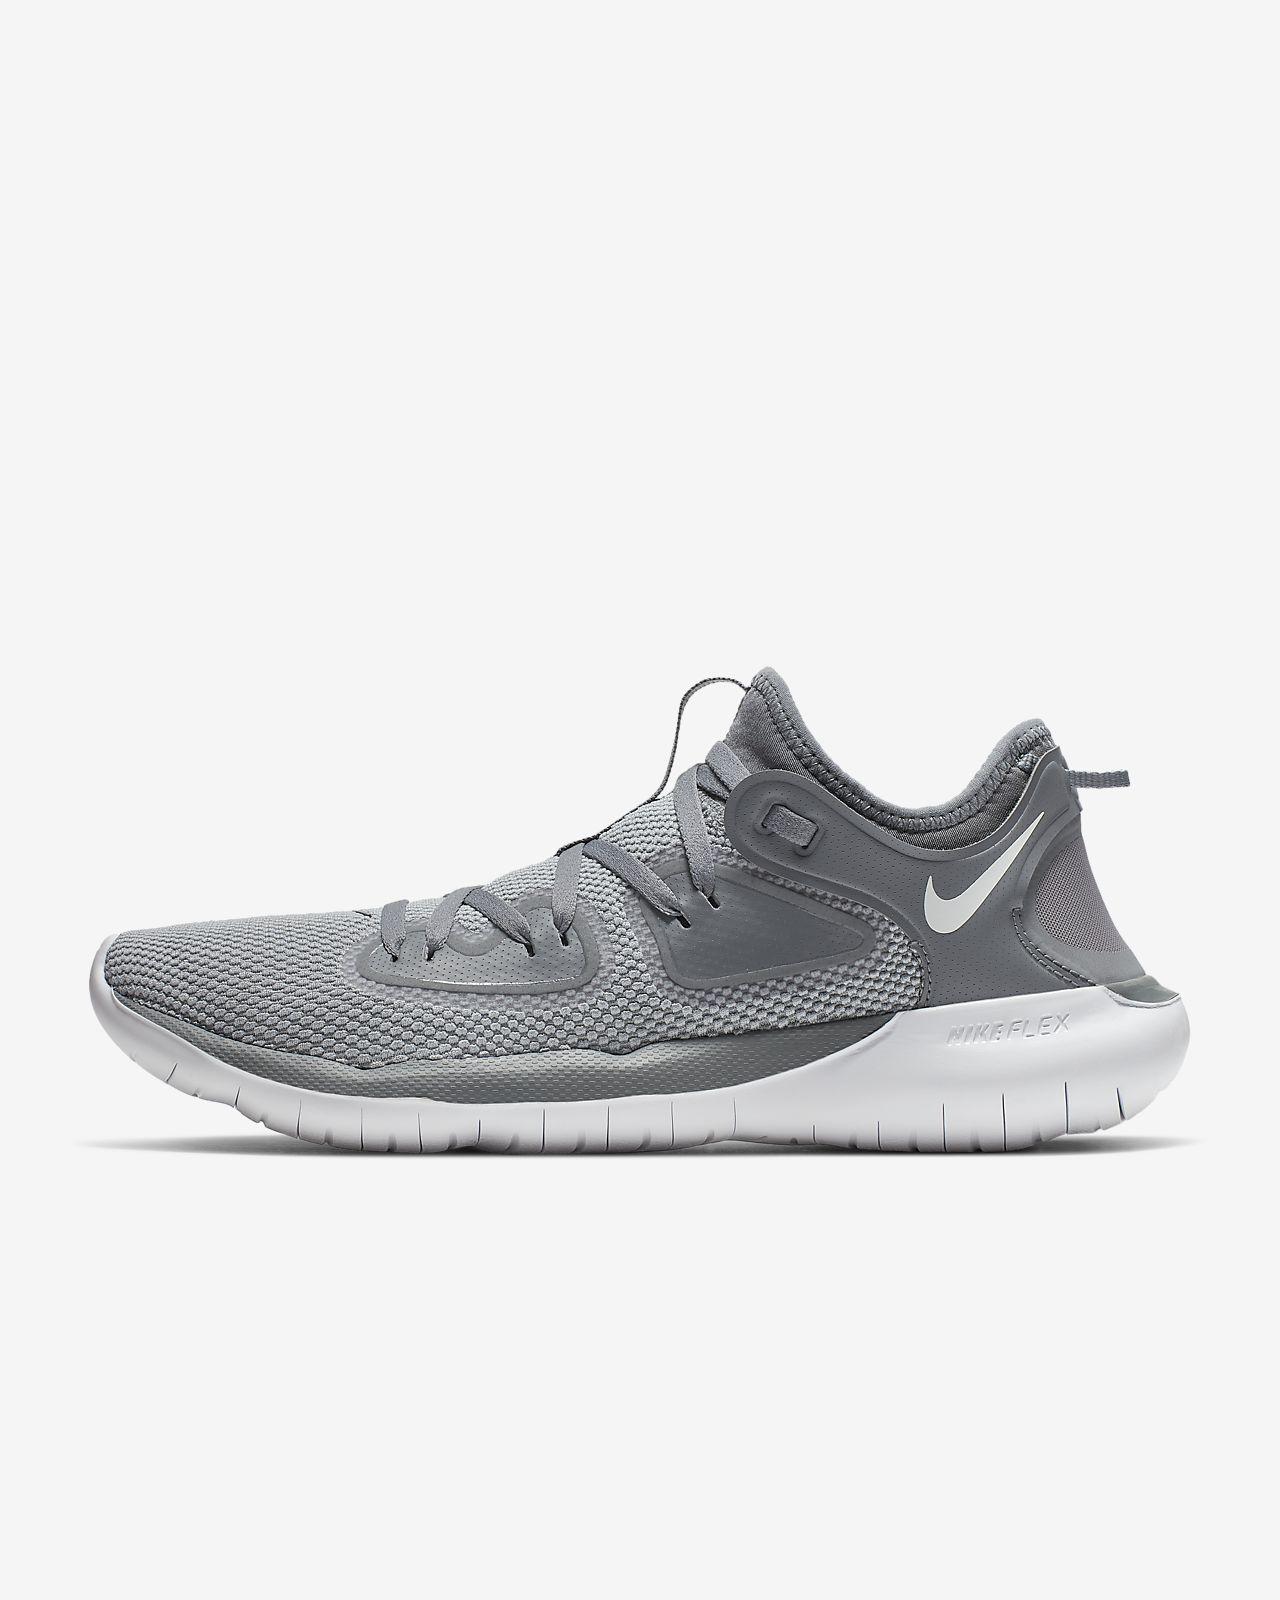 nike scarpe ragazzo 2019